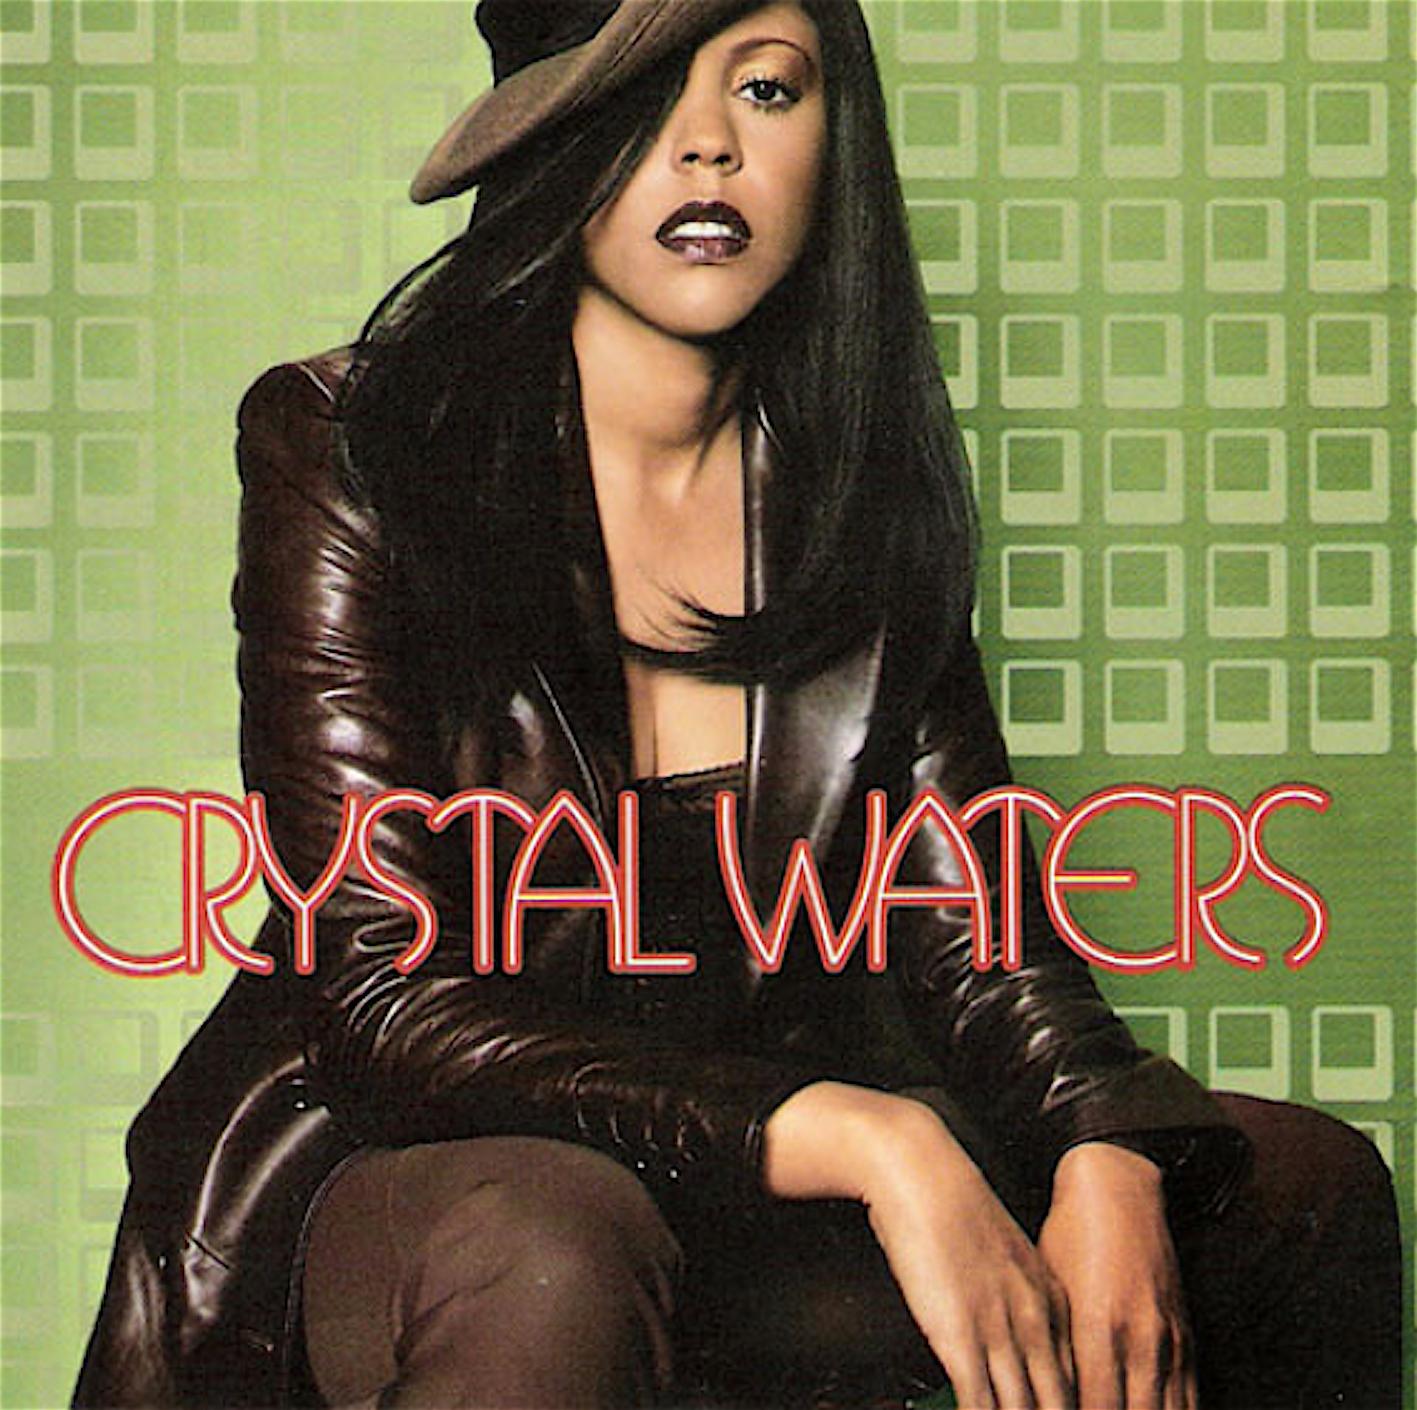 Crystal_waters_1991_gypsy_woman